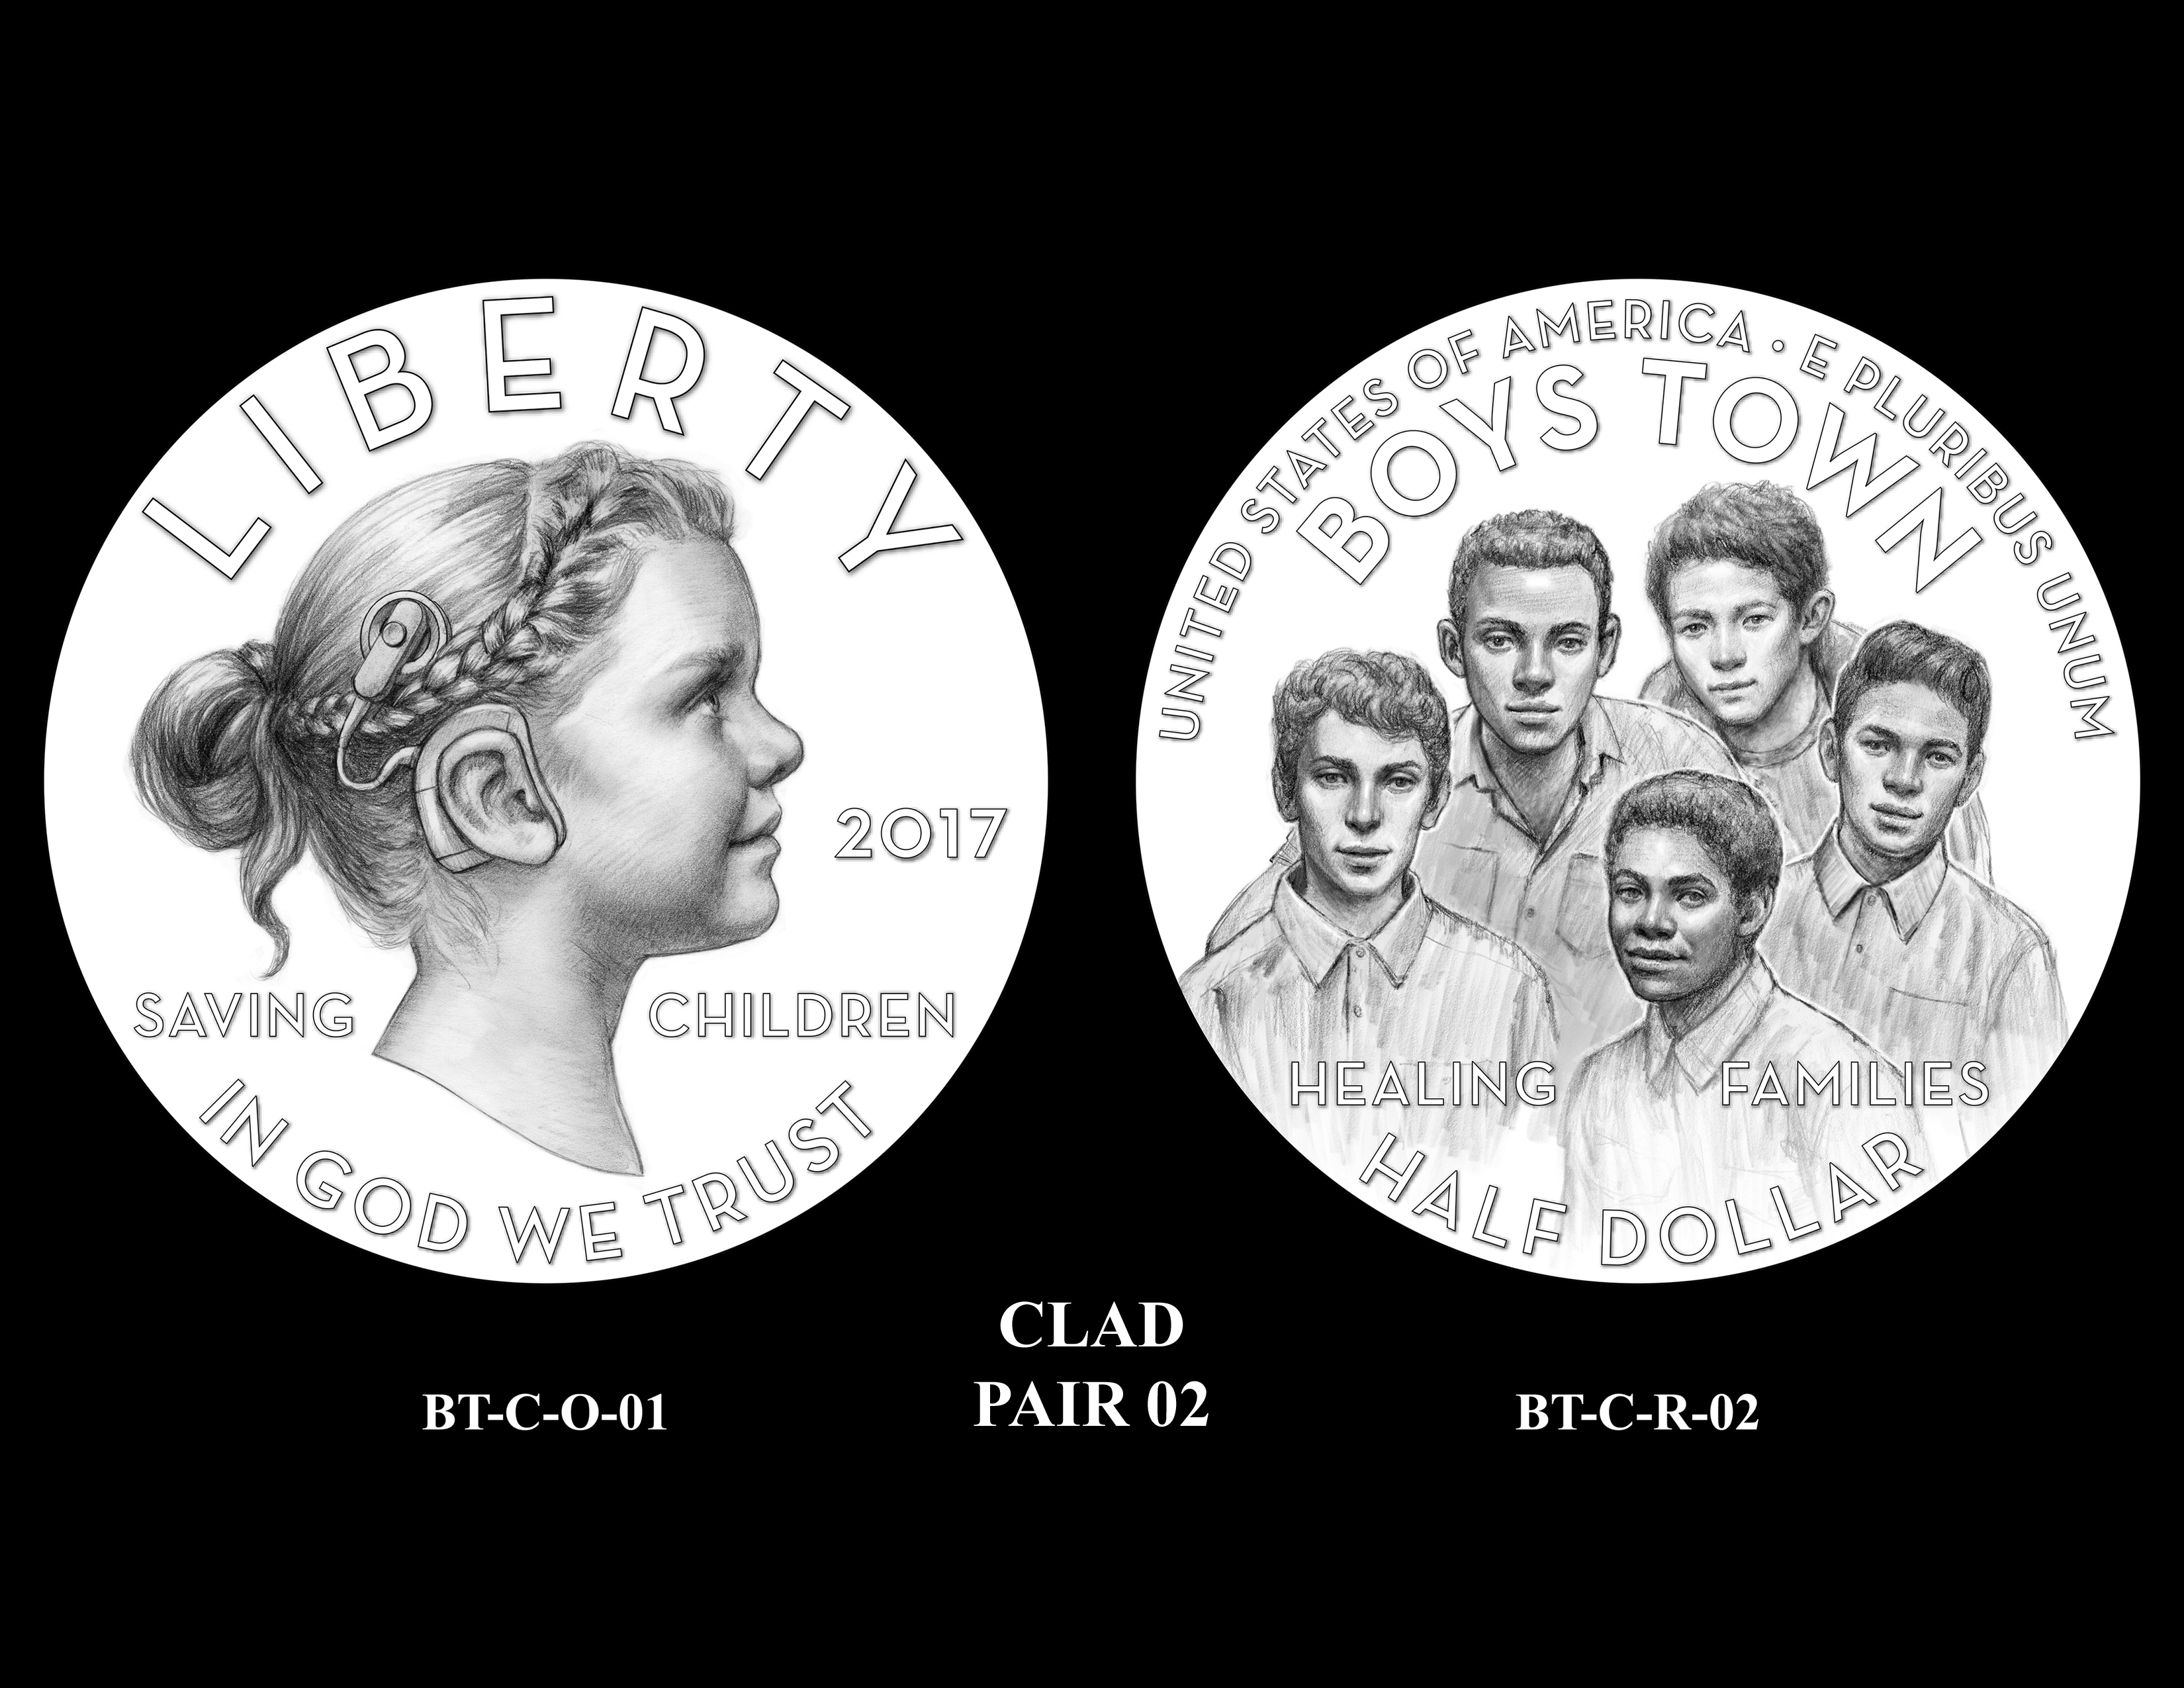 Clad-Pair-02 -- 2017 Boystown Centennial Commemorative Coin  Program